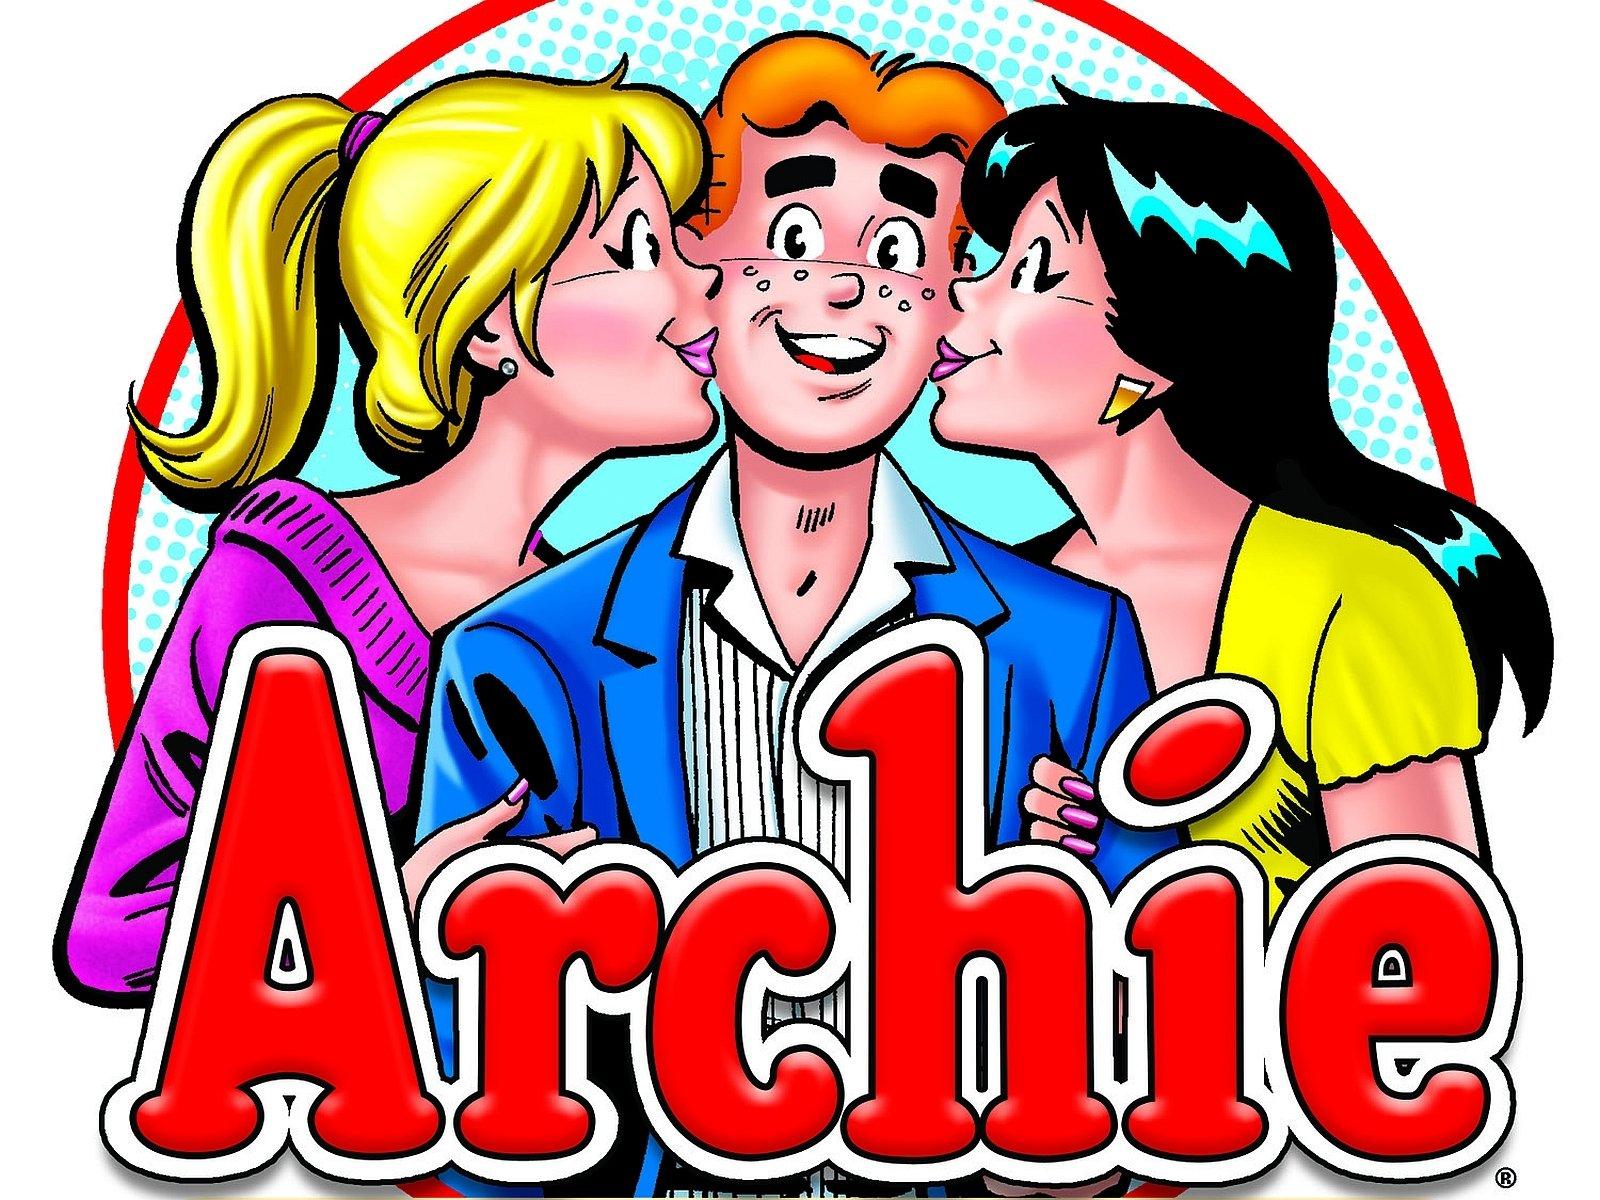 ARCHIE.